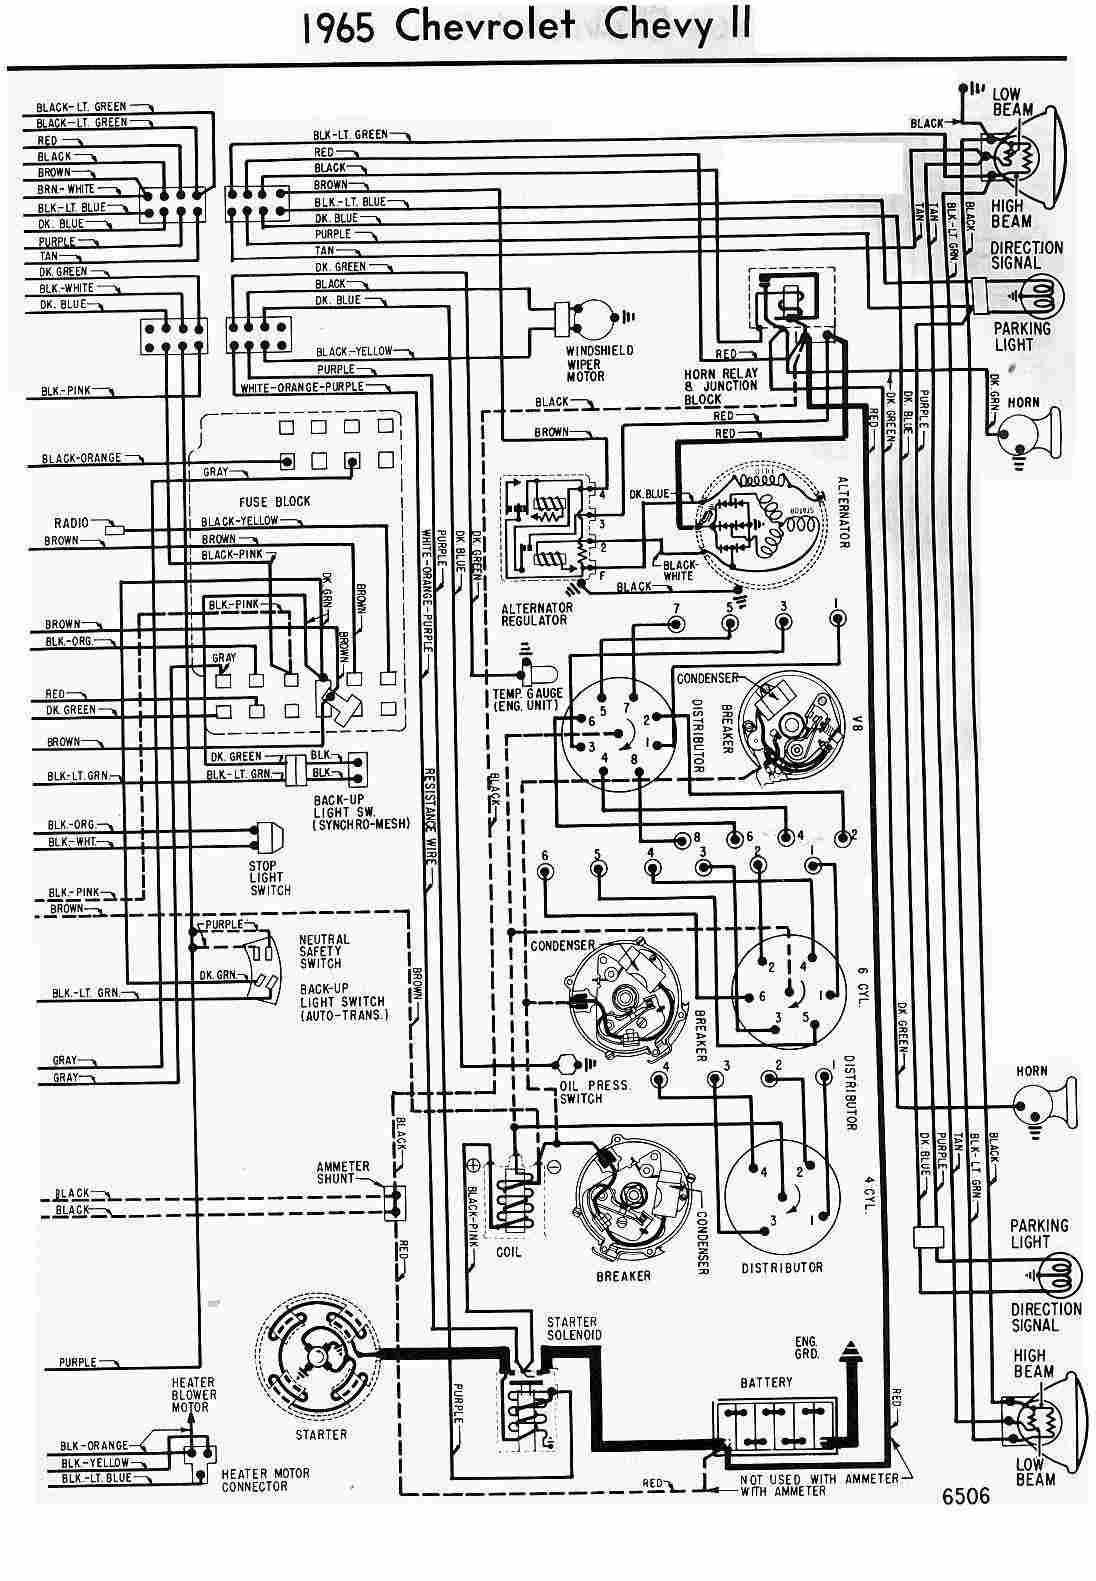 68 Camaro Painless Wiring Harness - Wiring Solutions